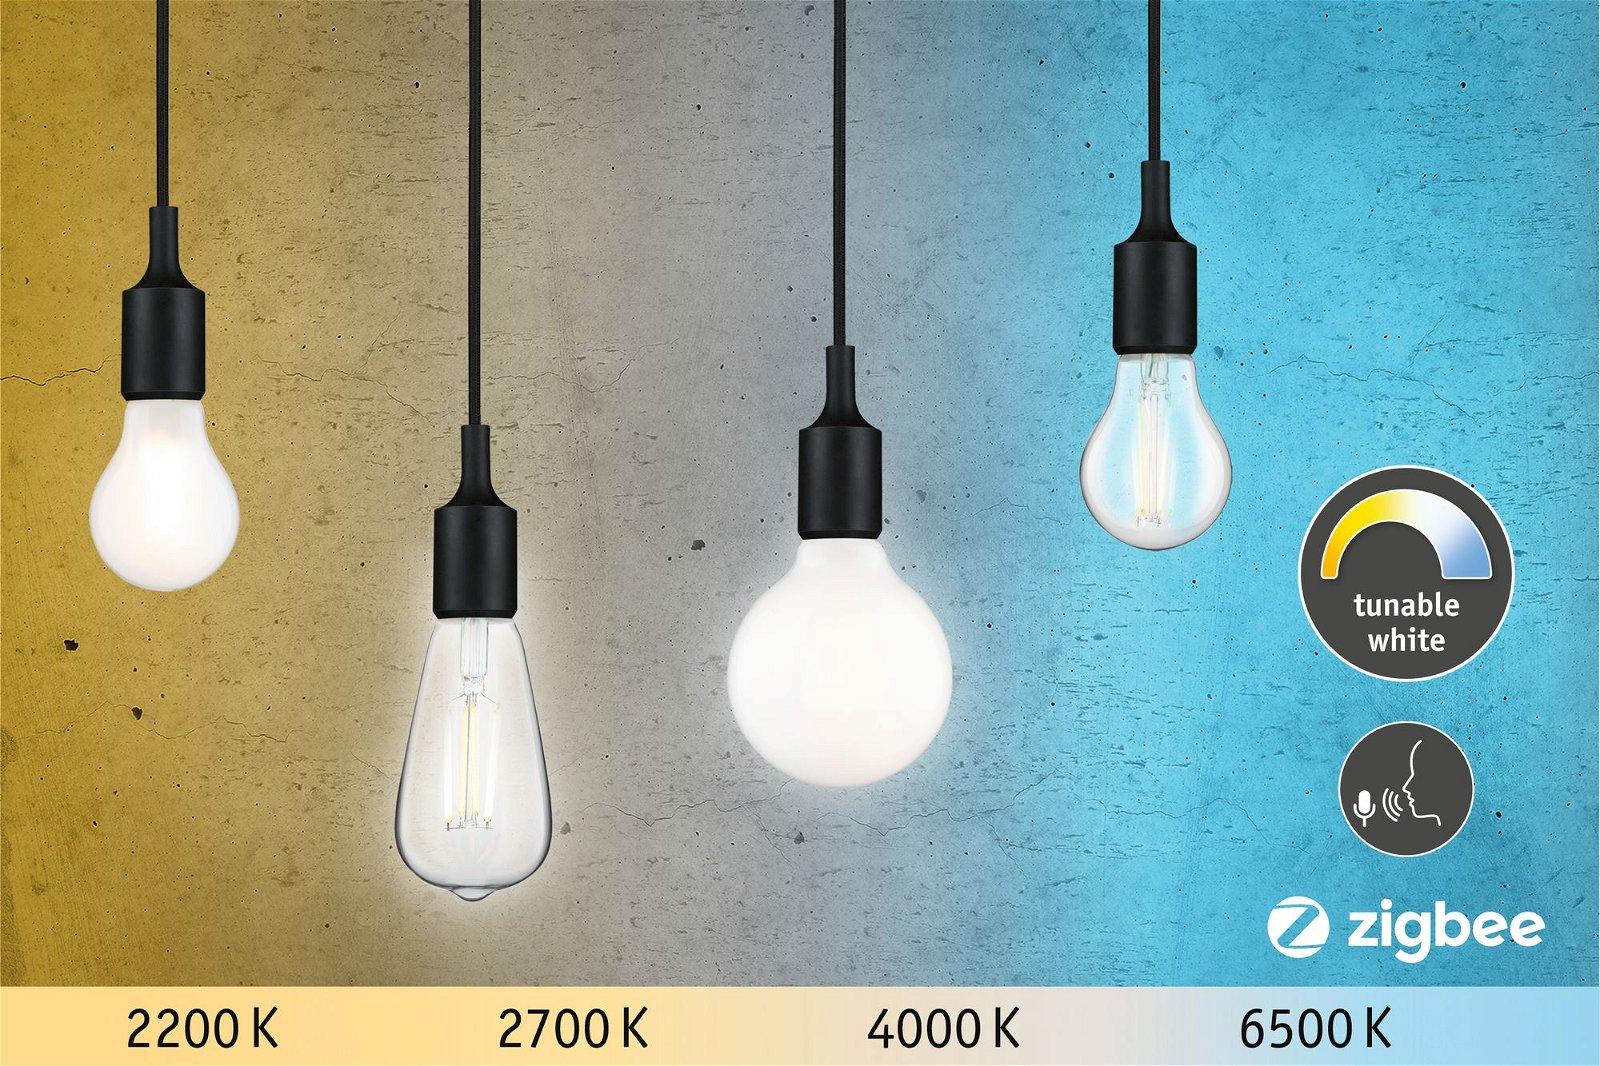 LED Birne Smart Home Zigbee Filament E27 230V 470lm 4,7W Tunable White Matt